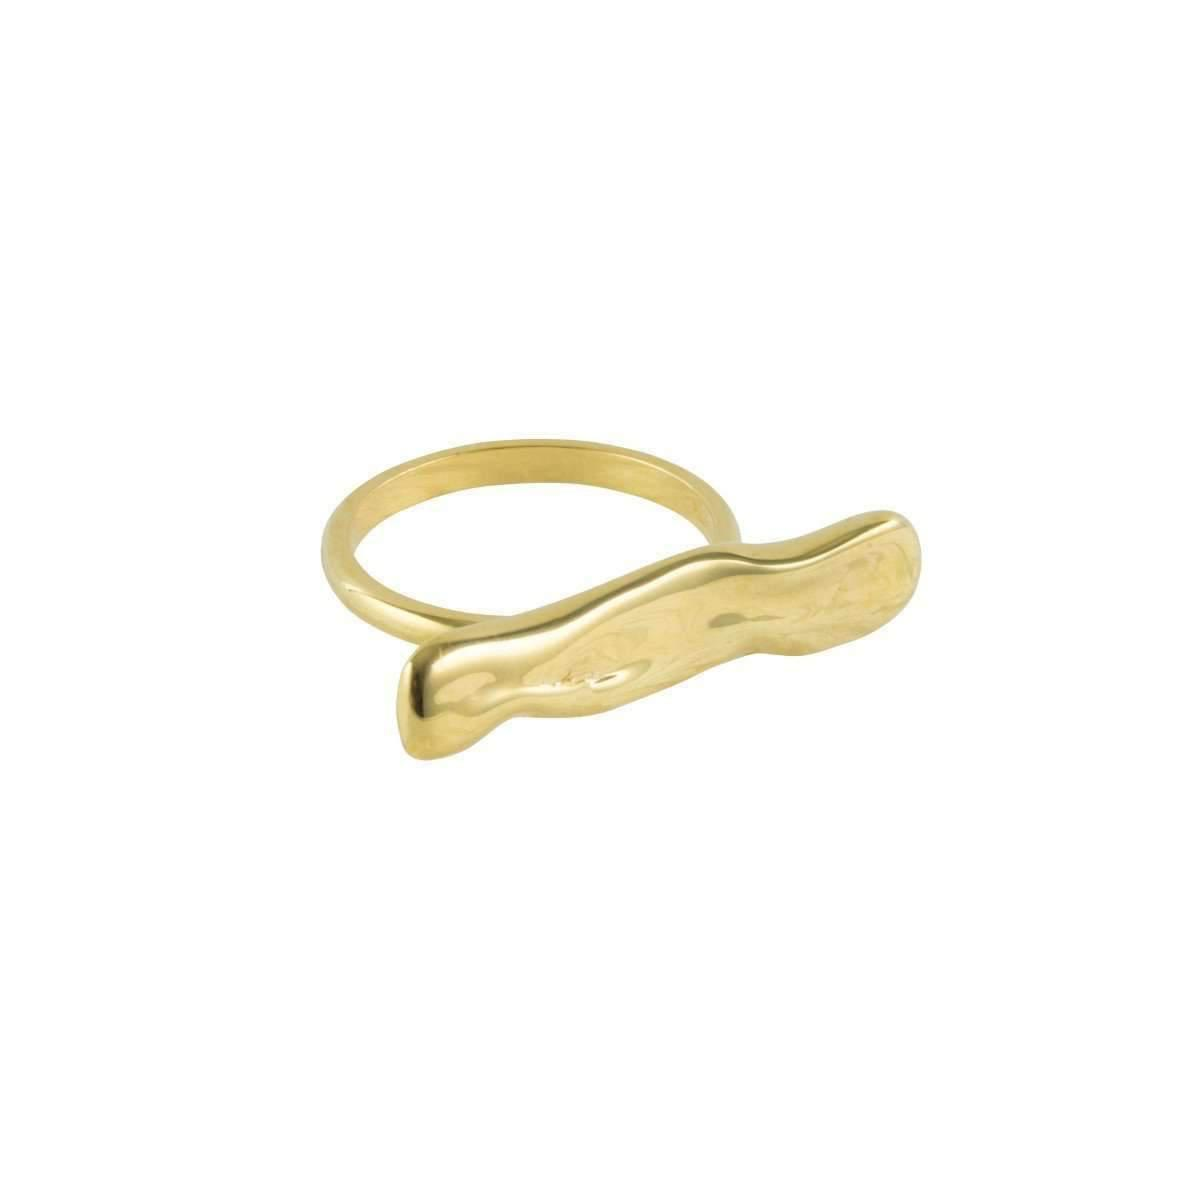 Deborah Blyth Jewellery Wave Ring - UK U - US 10 1/4 - EU 62 3/4 Yokh2ZSb